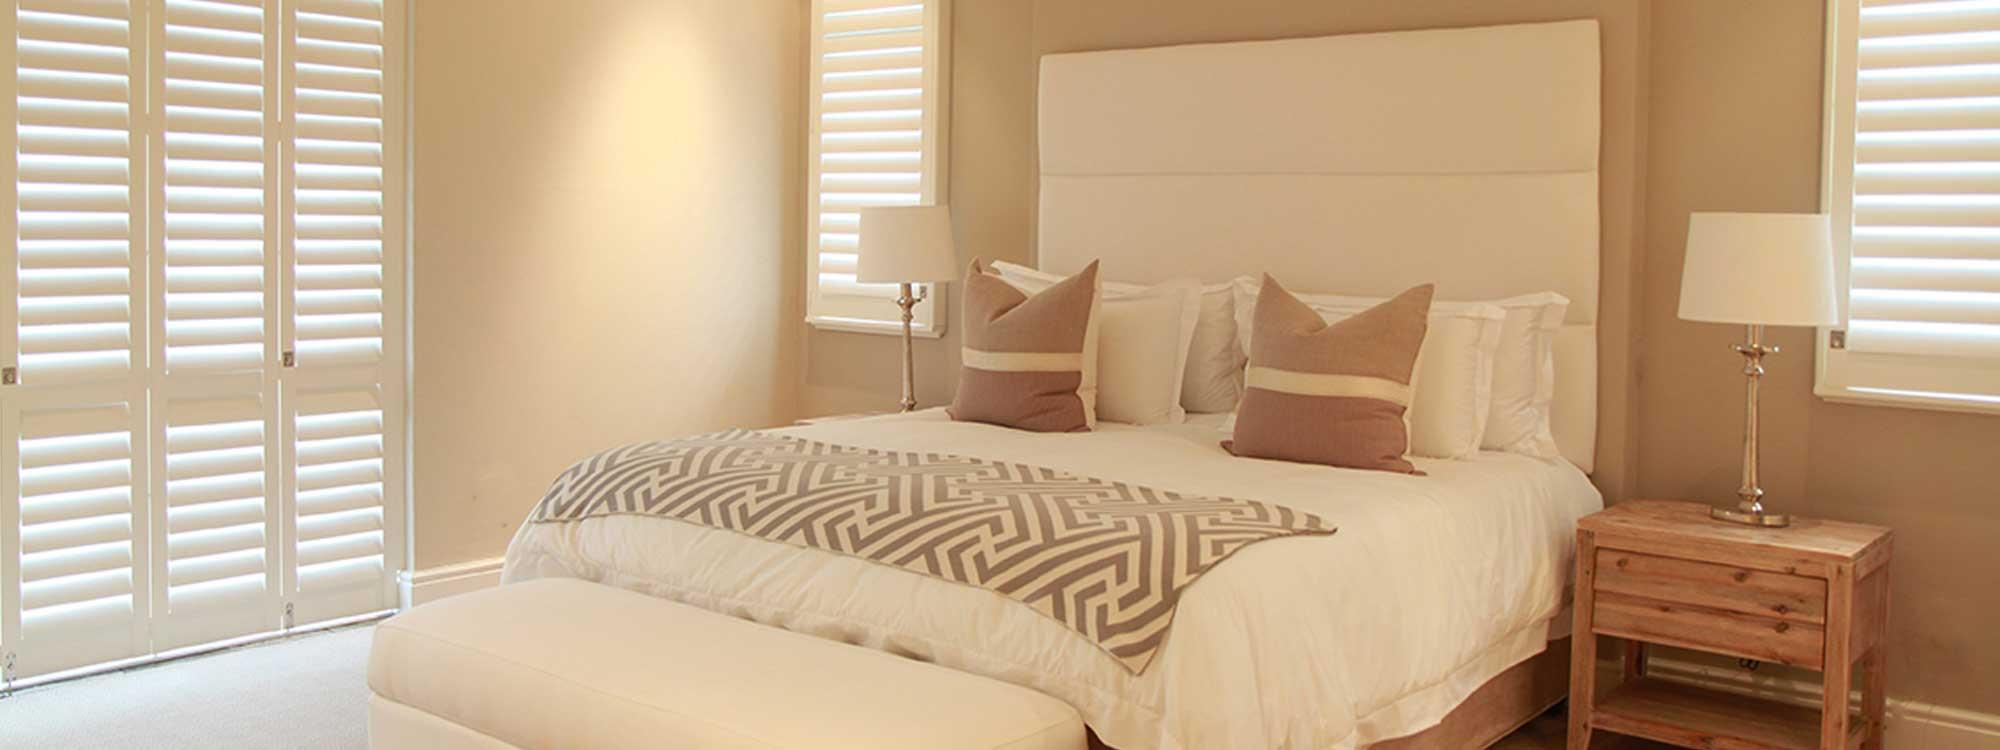 Decowood-shutters-bedroom-neutral